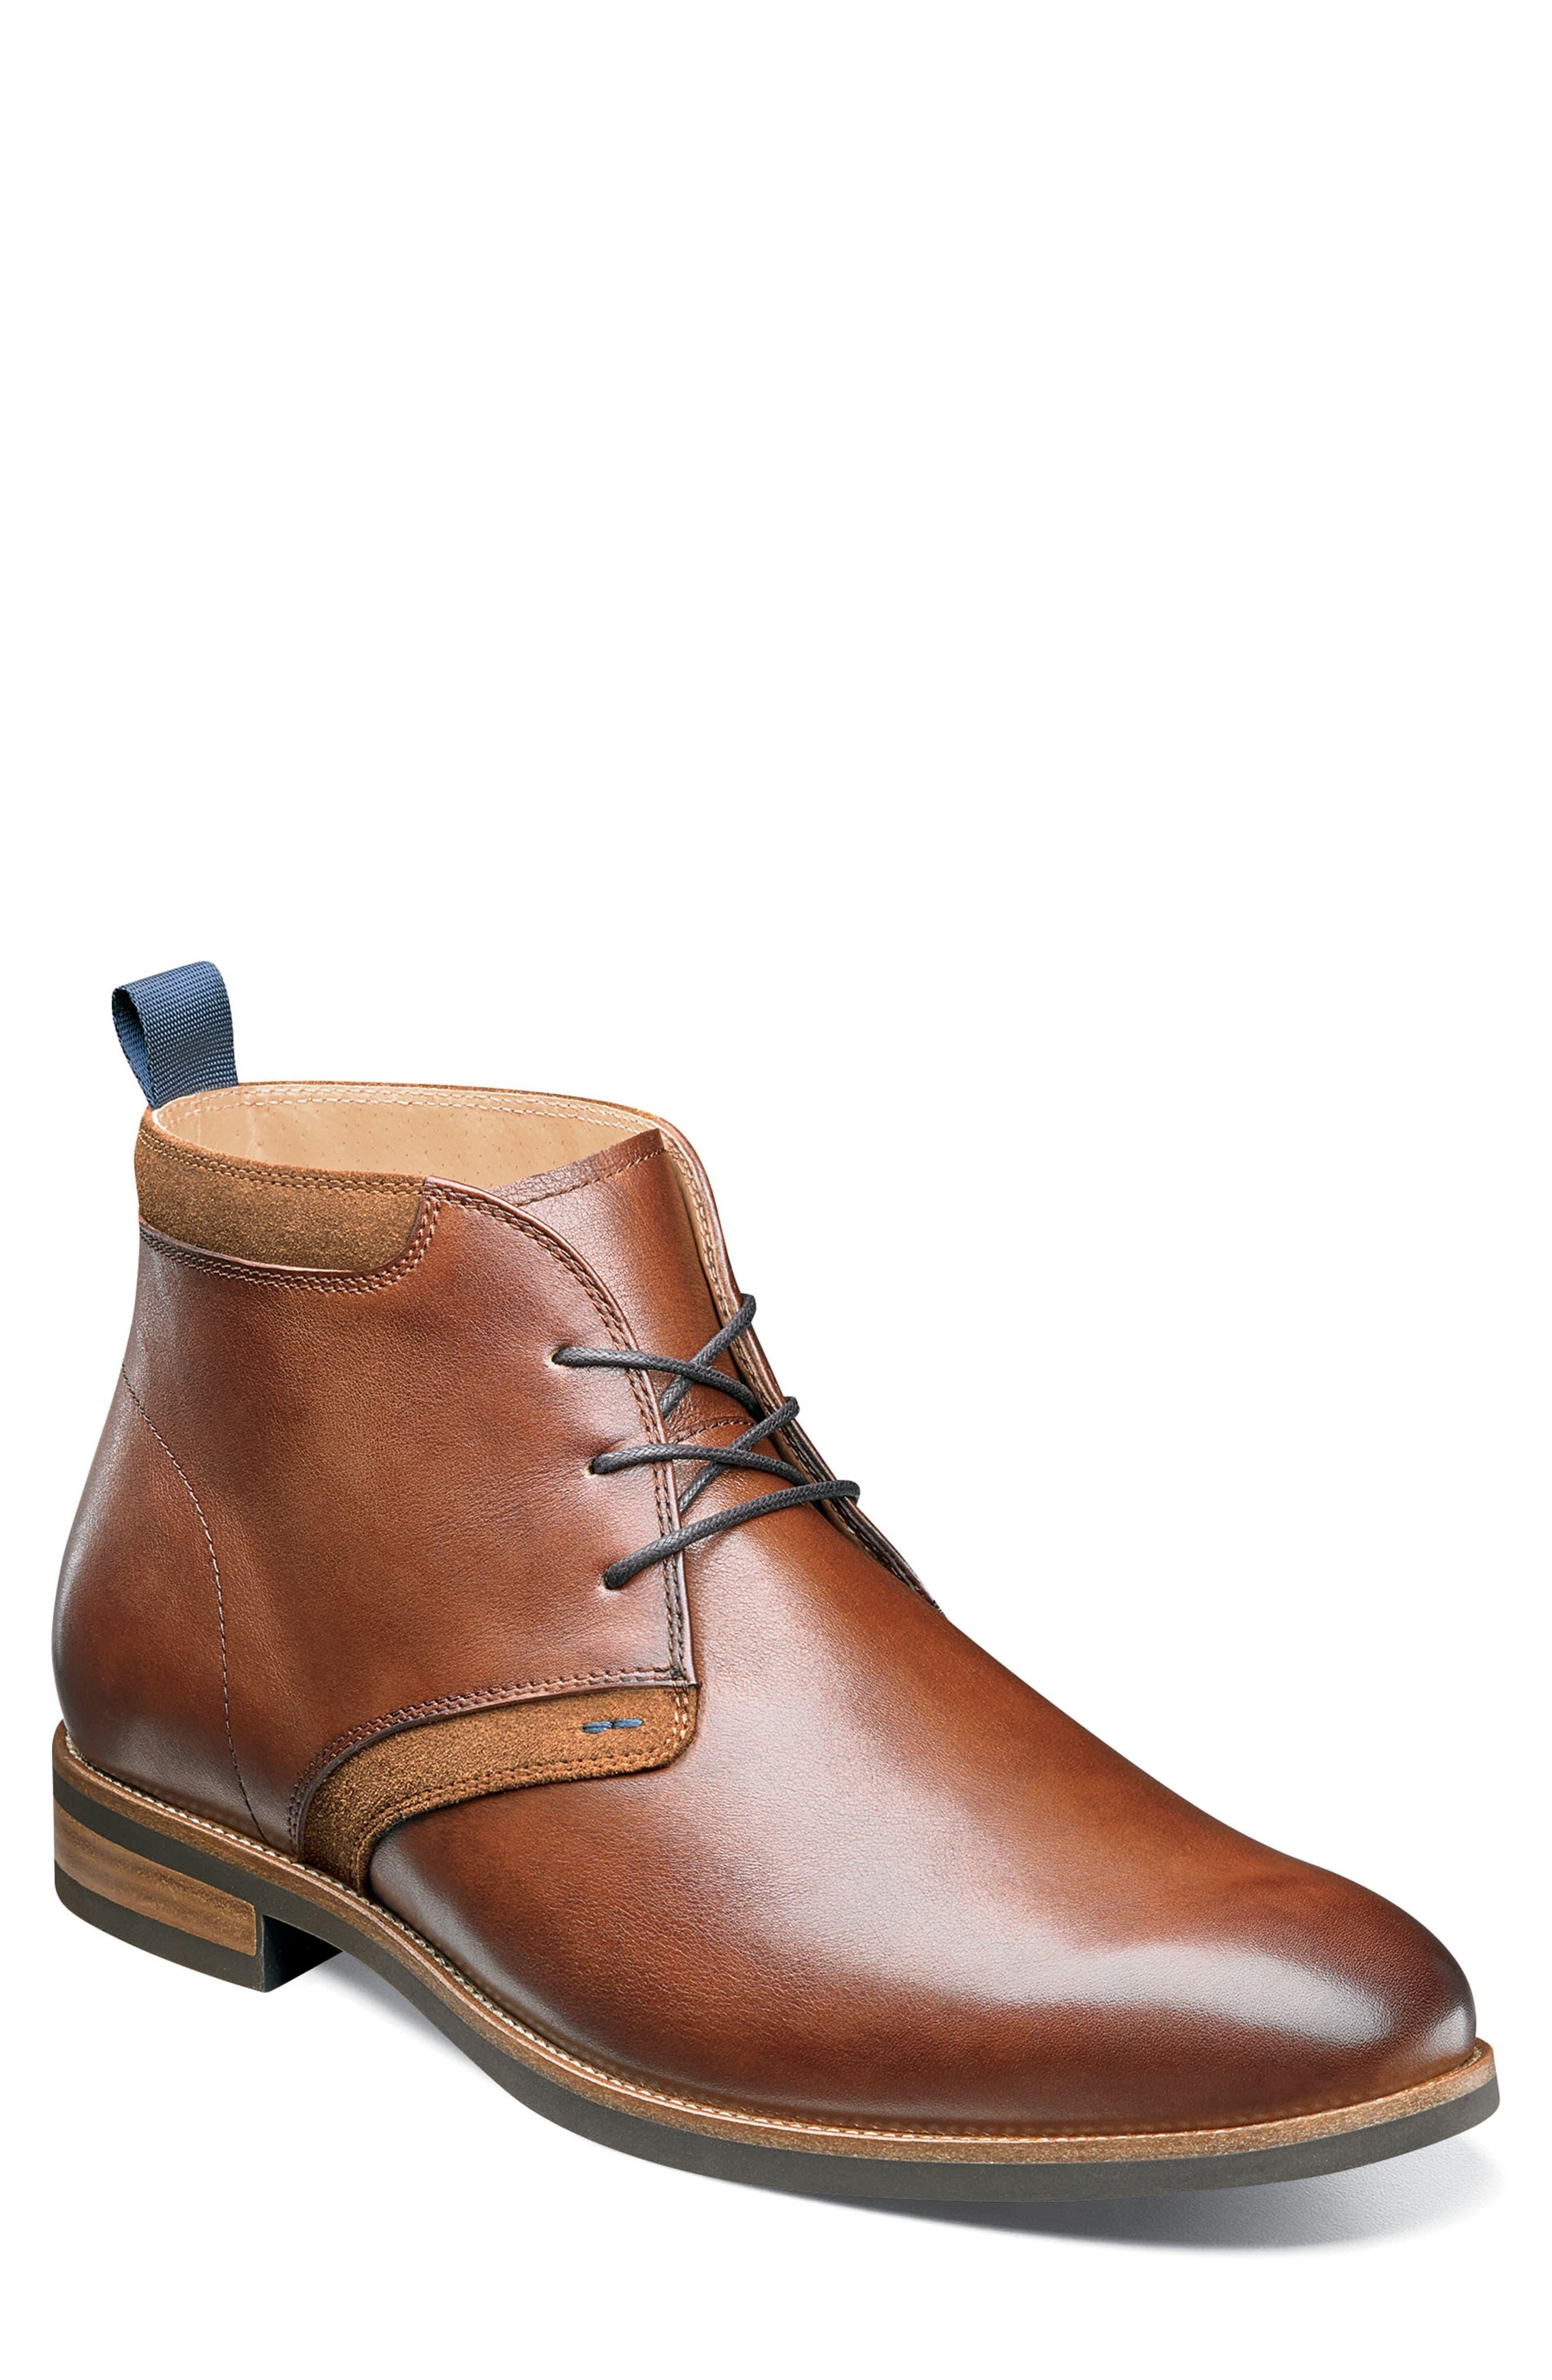 Florsheim Uptown Chukka Boot EEE - Brown